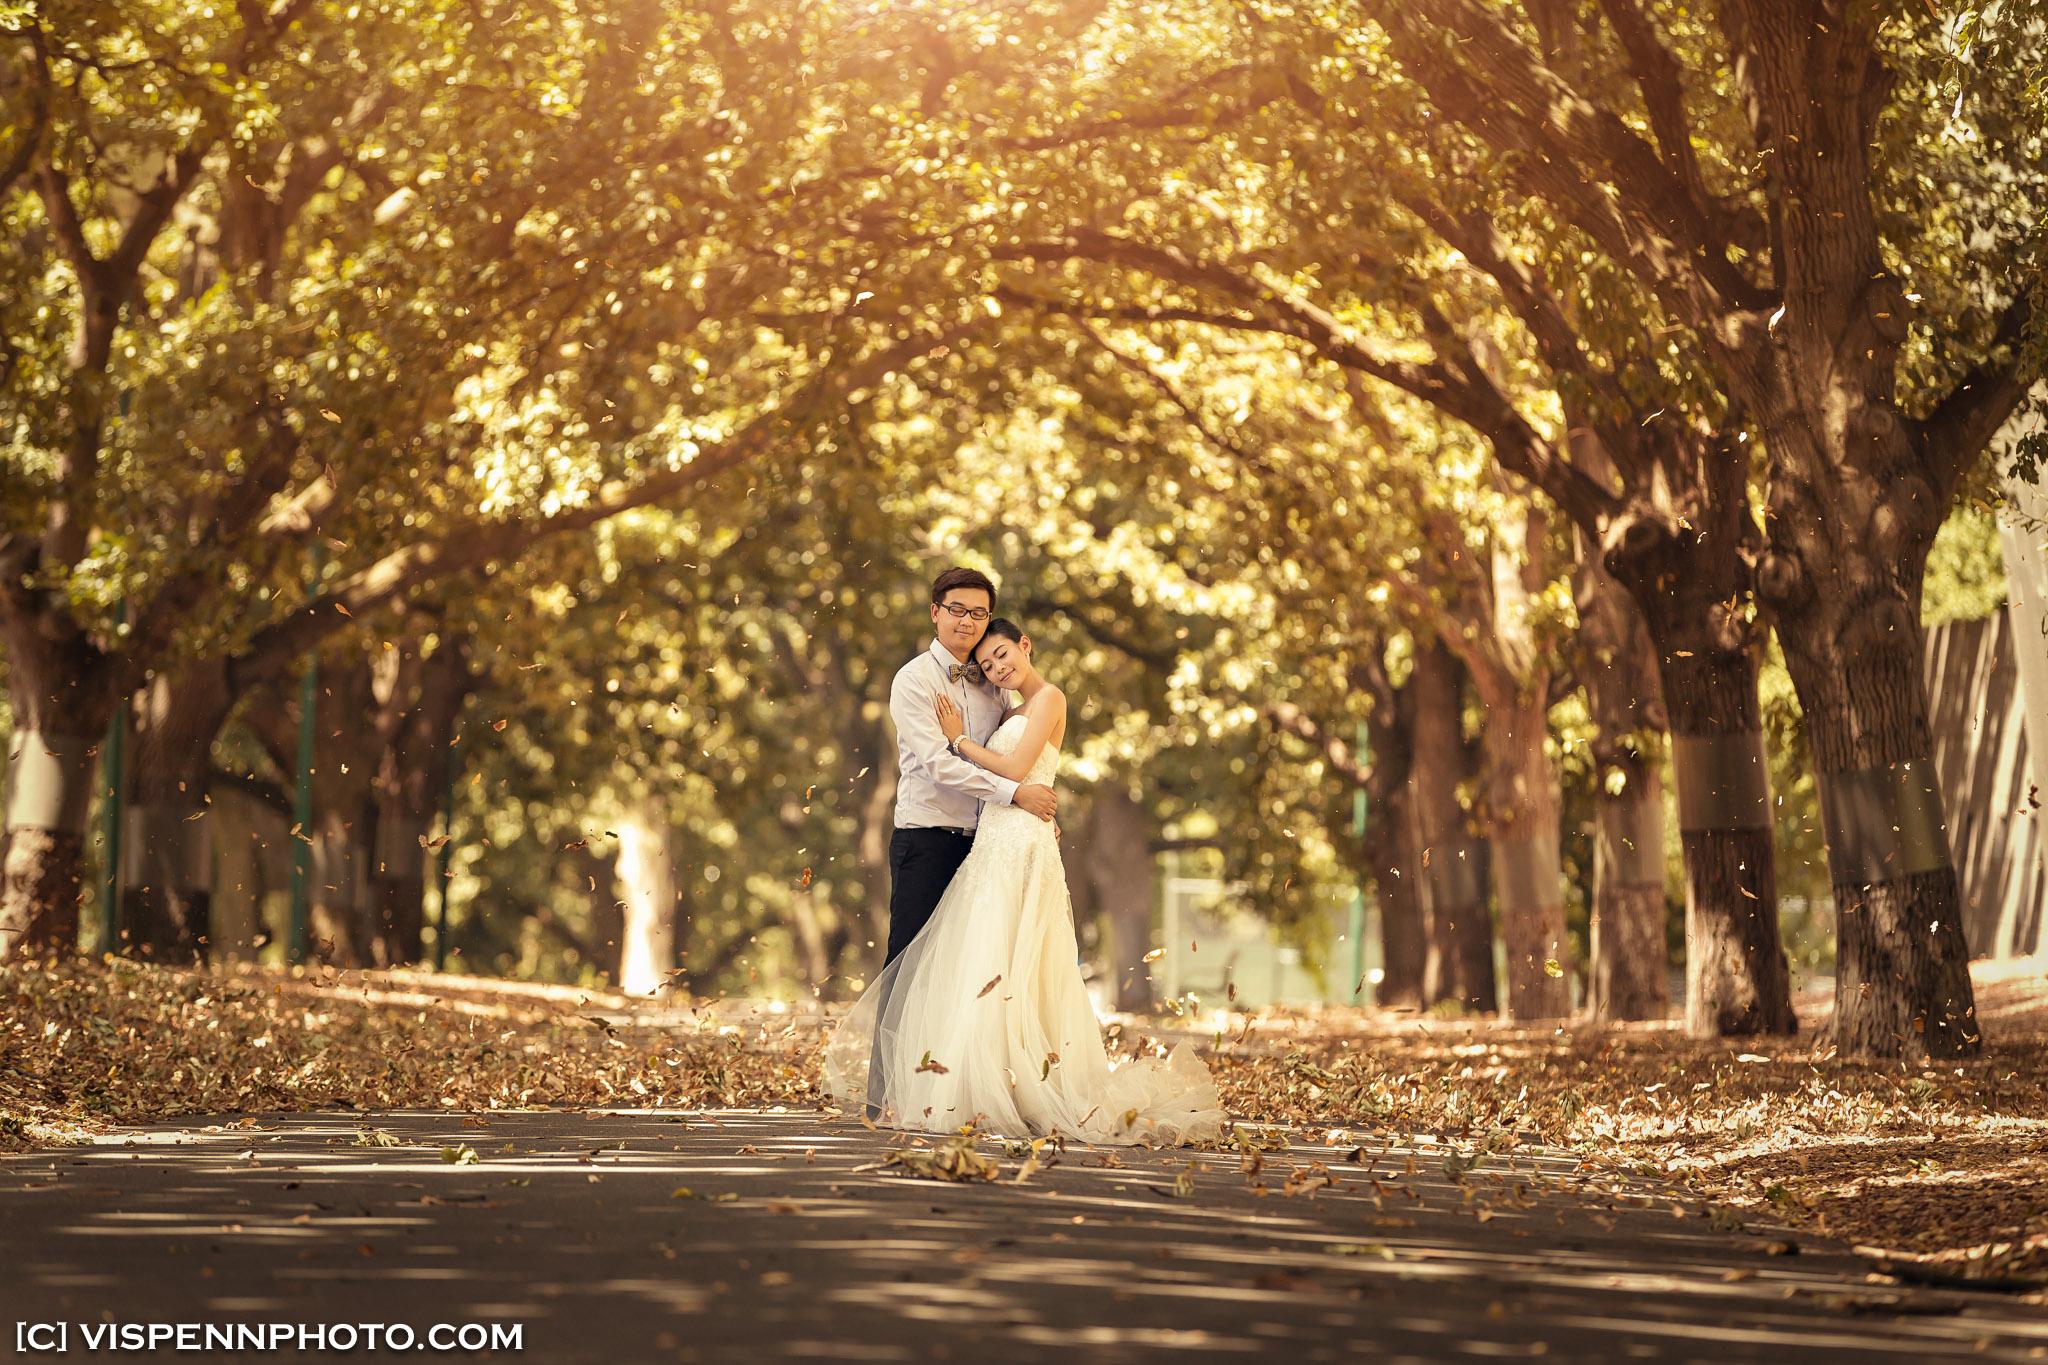 PRE WEDDING Photography Melbourne KarenCai 2560 1